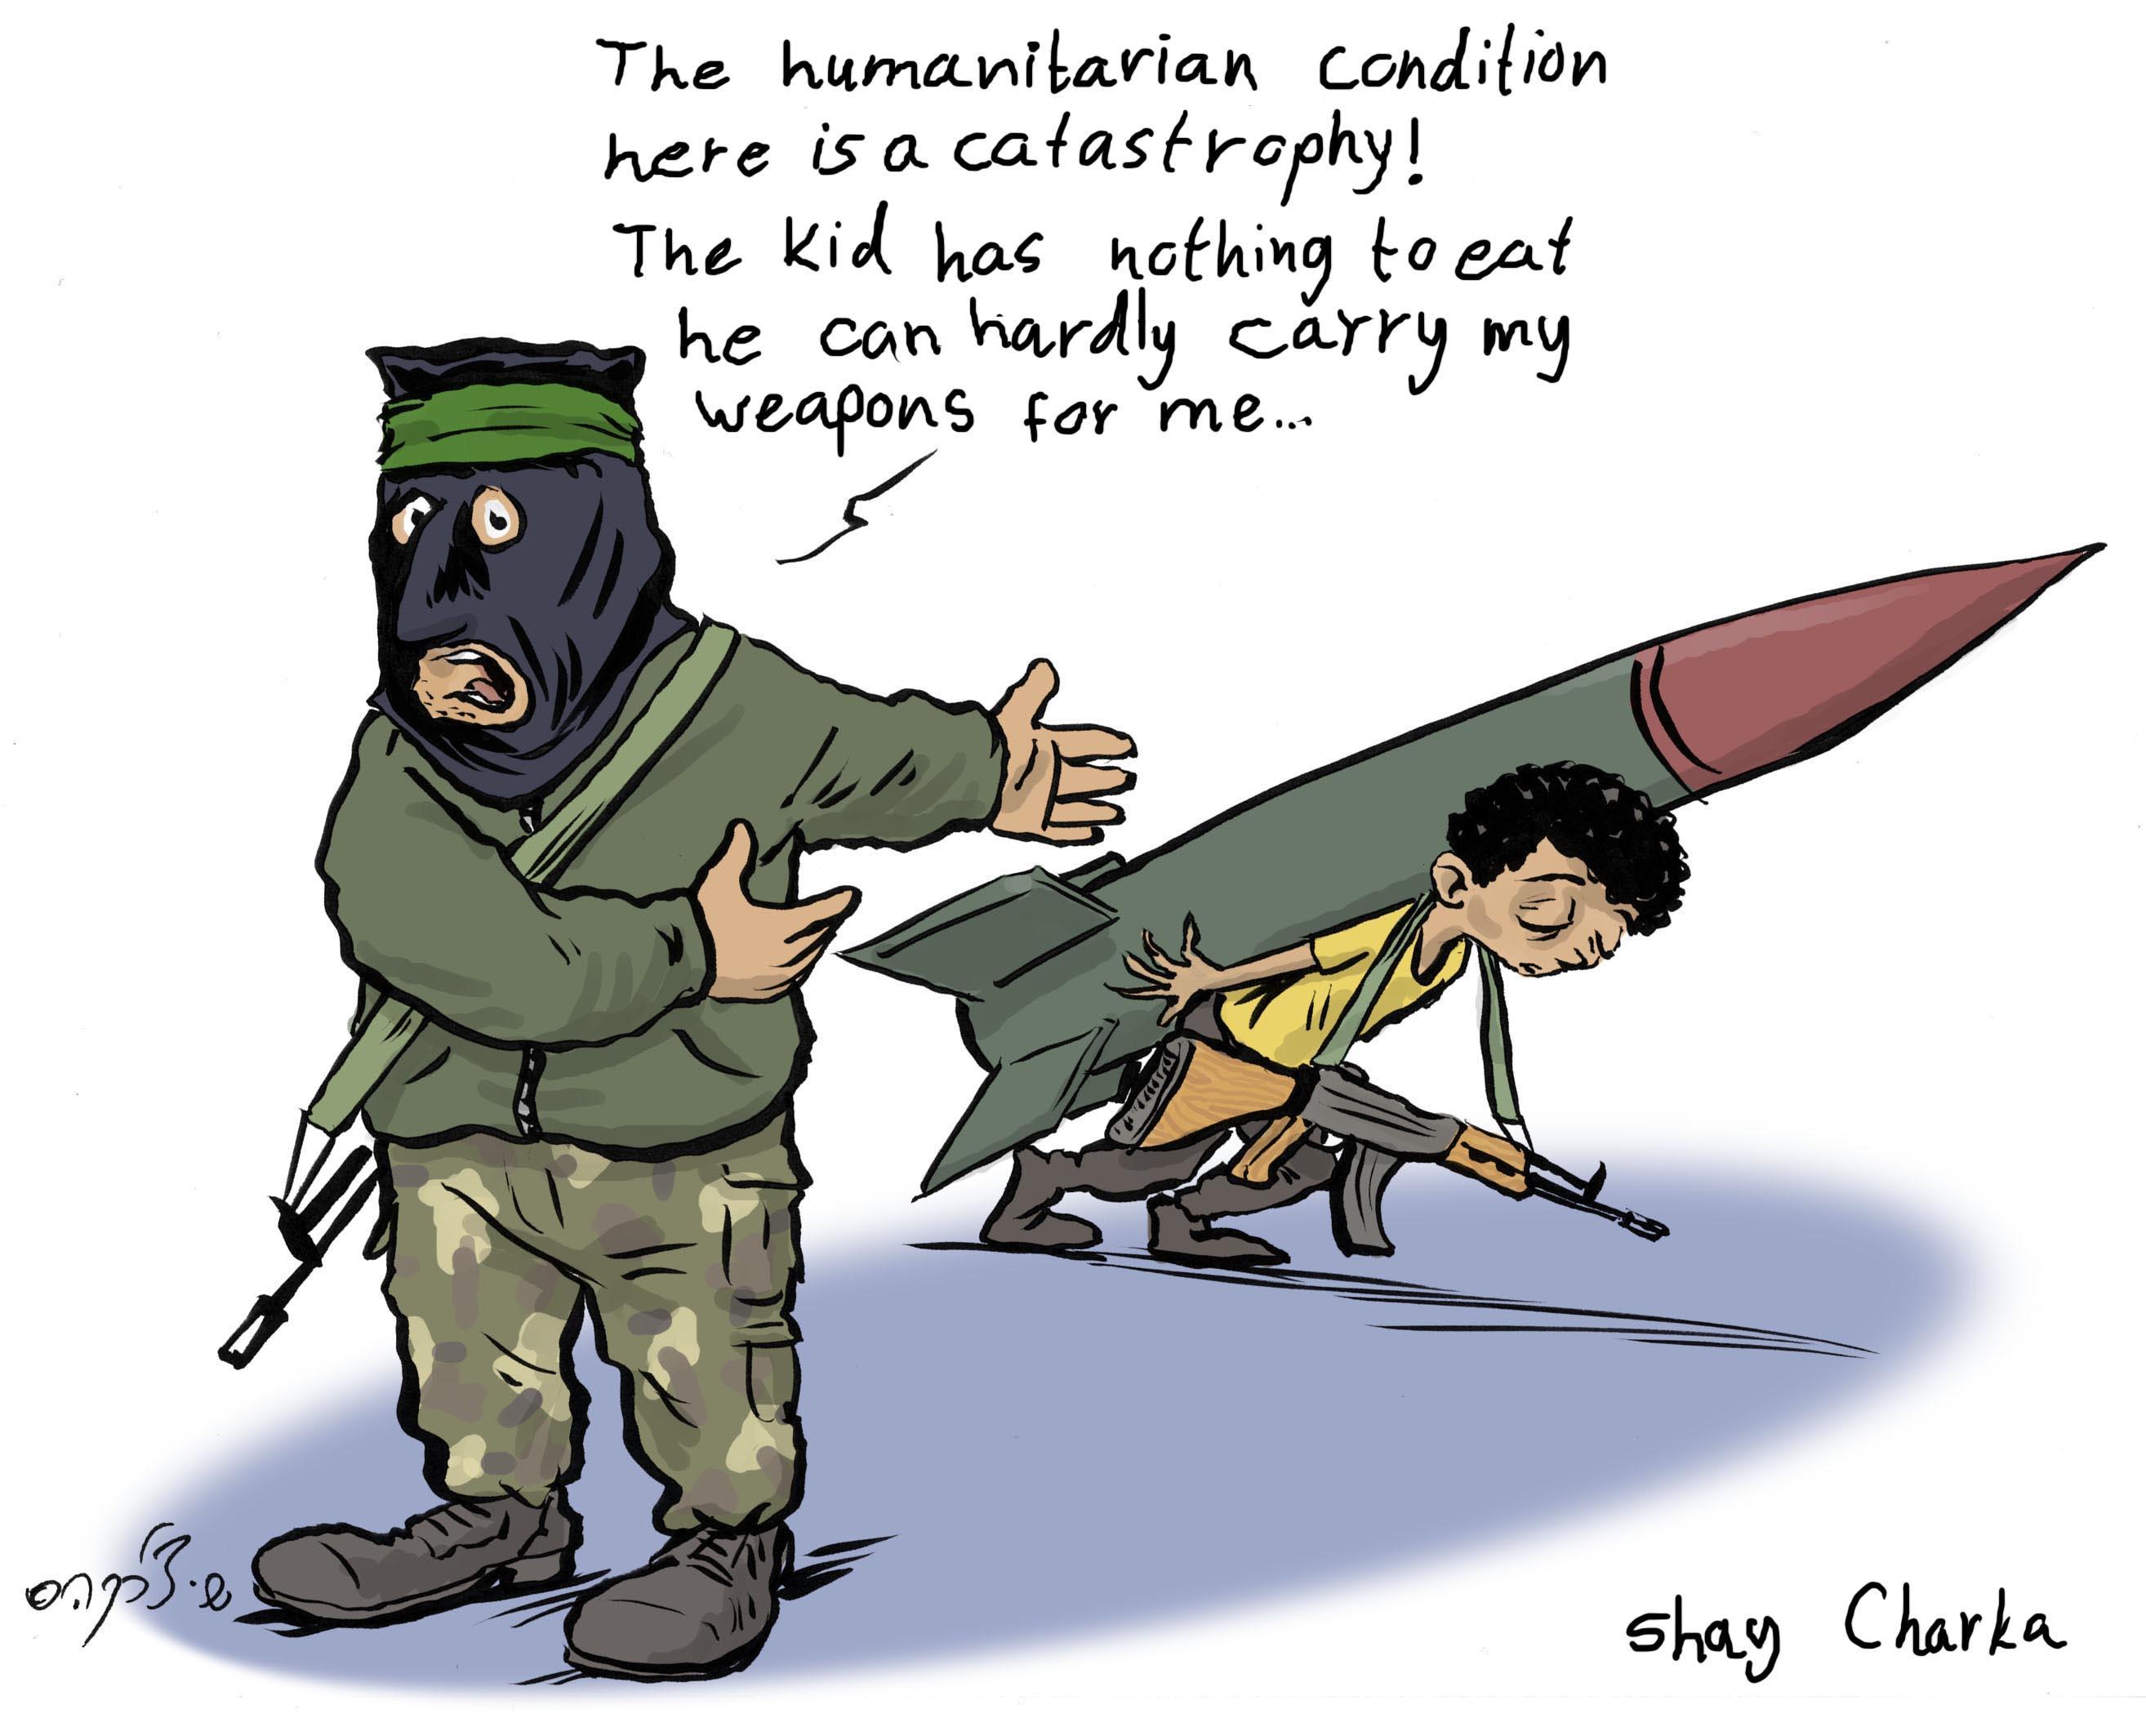 SHAY-CHARKA-cartoonist-6